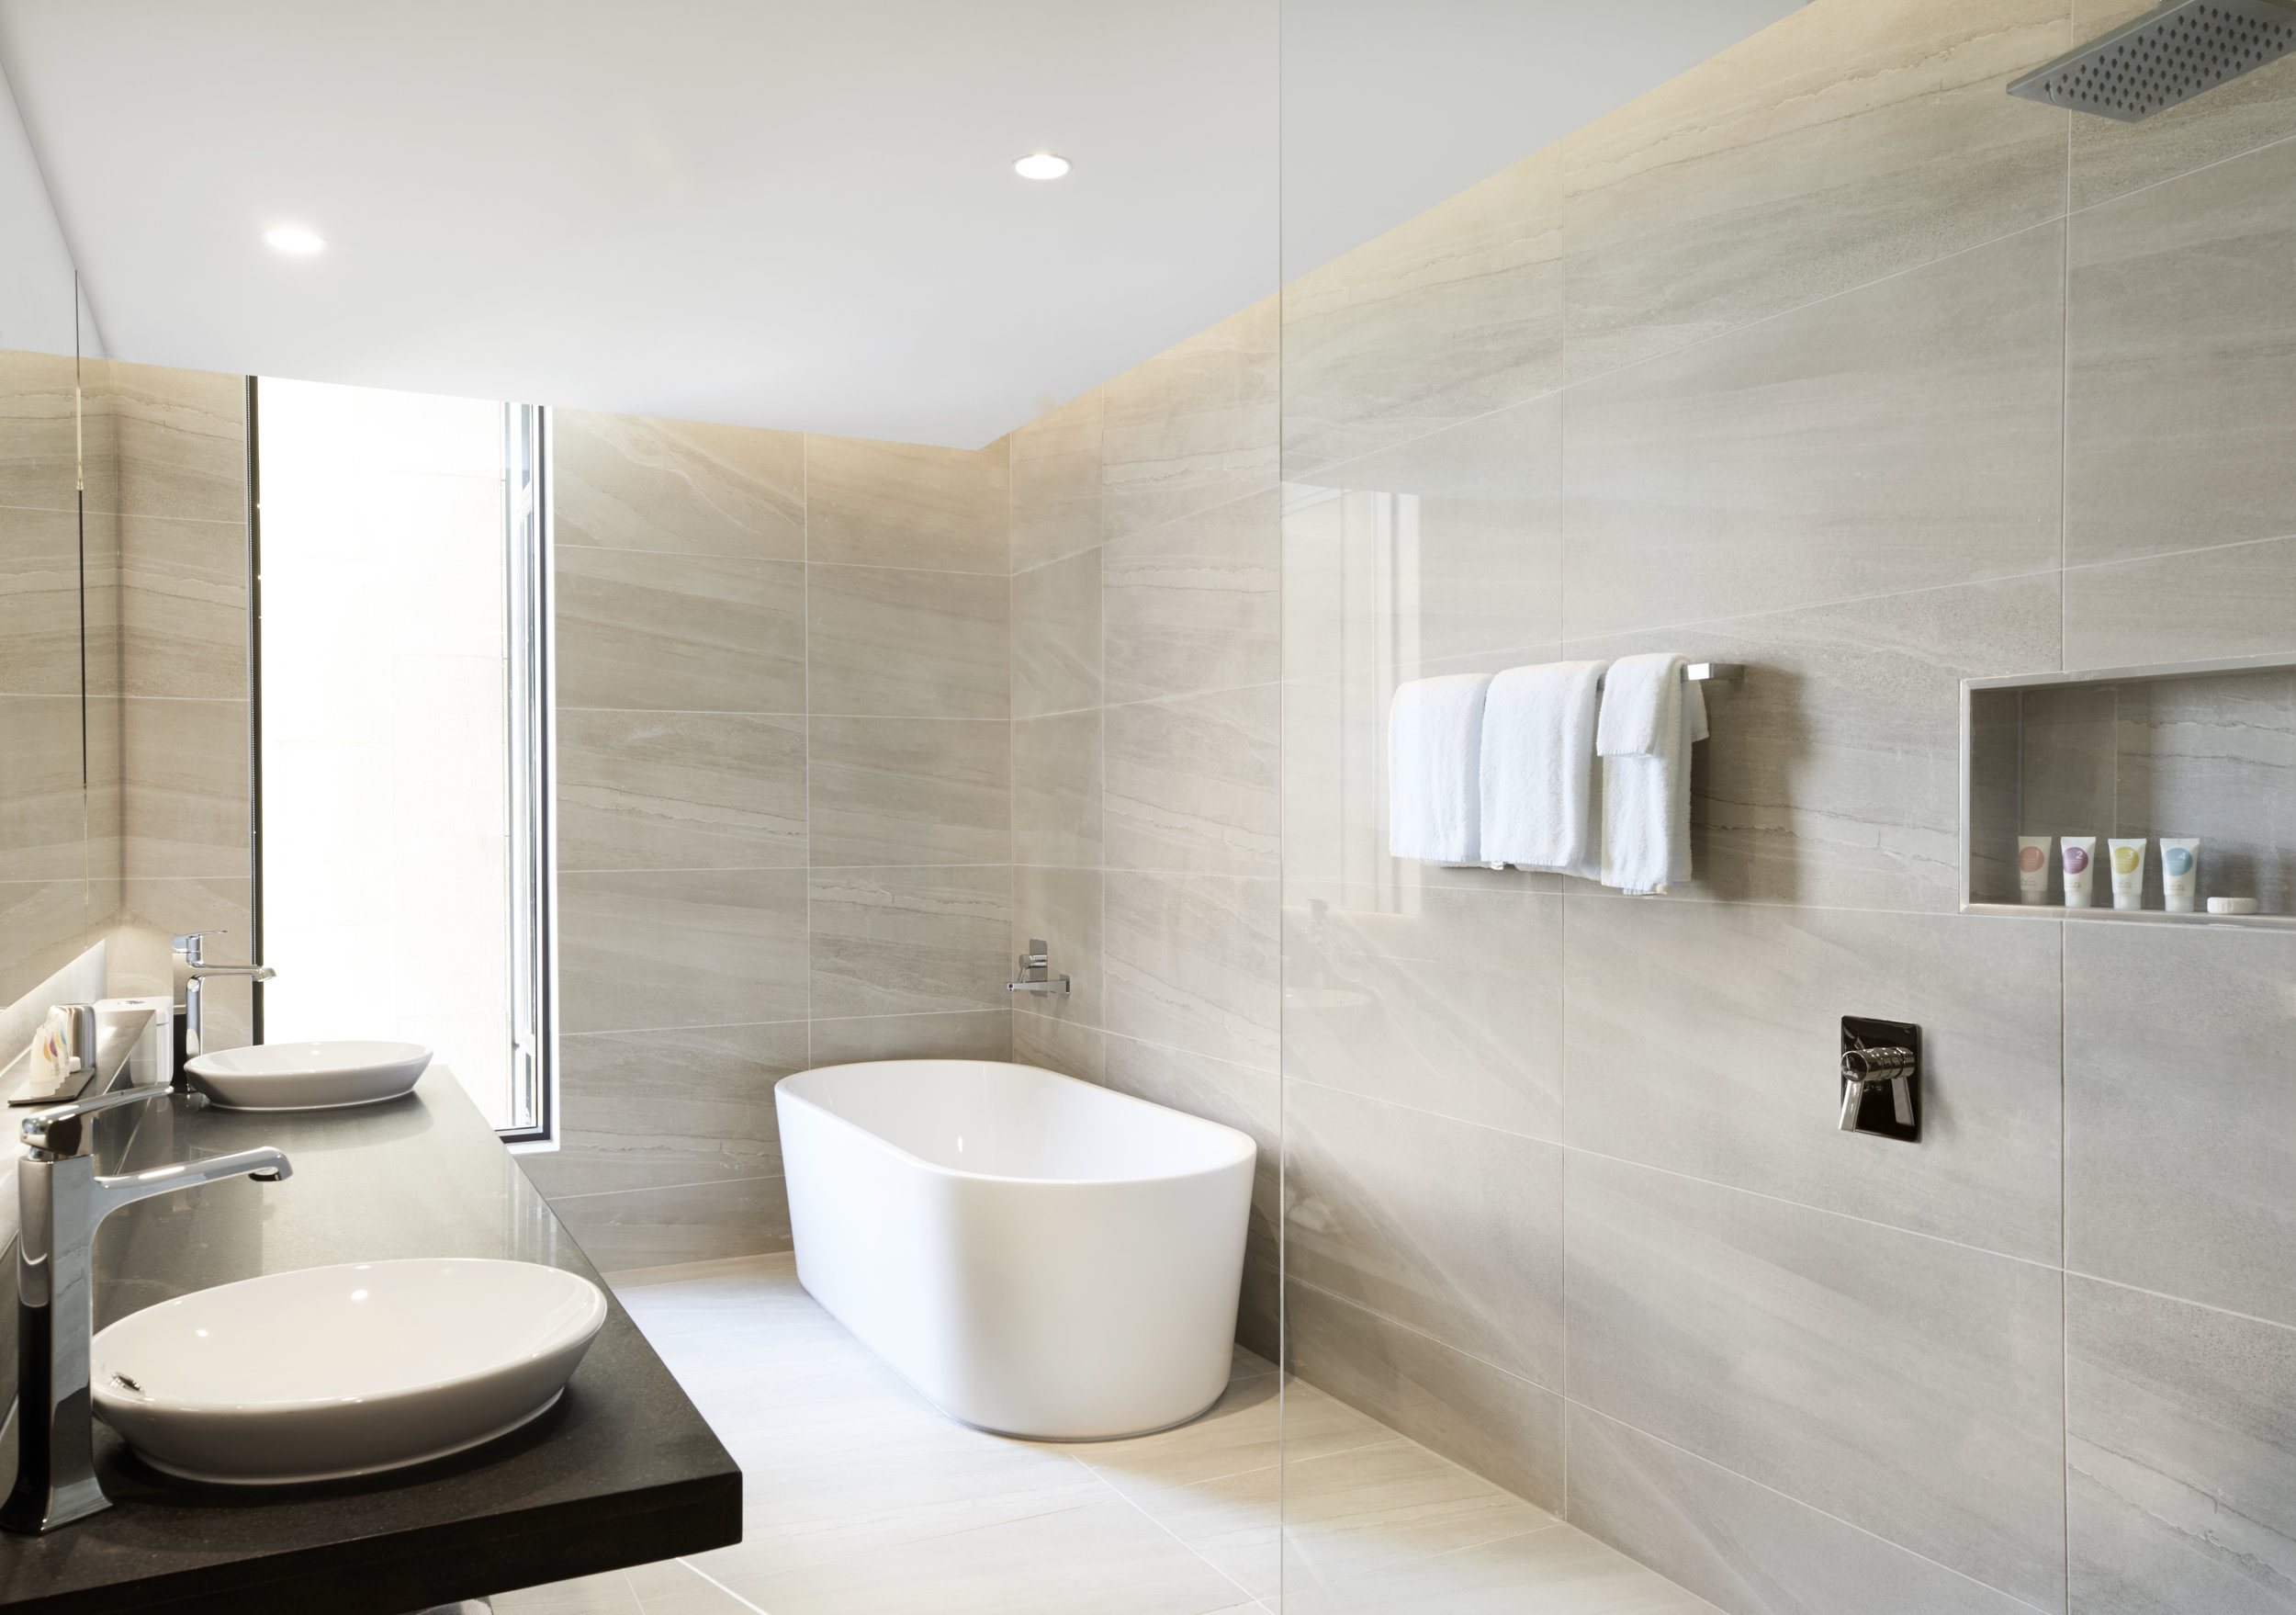 Hyatt Place Melbourne - Queen Bathroom.jpg